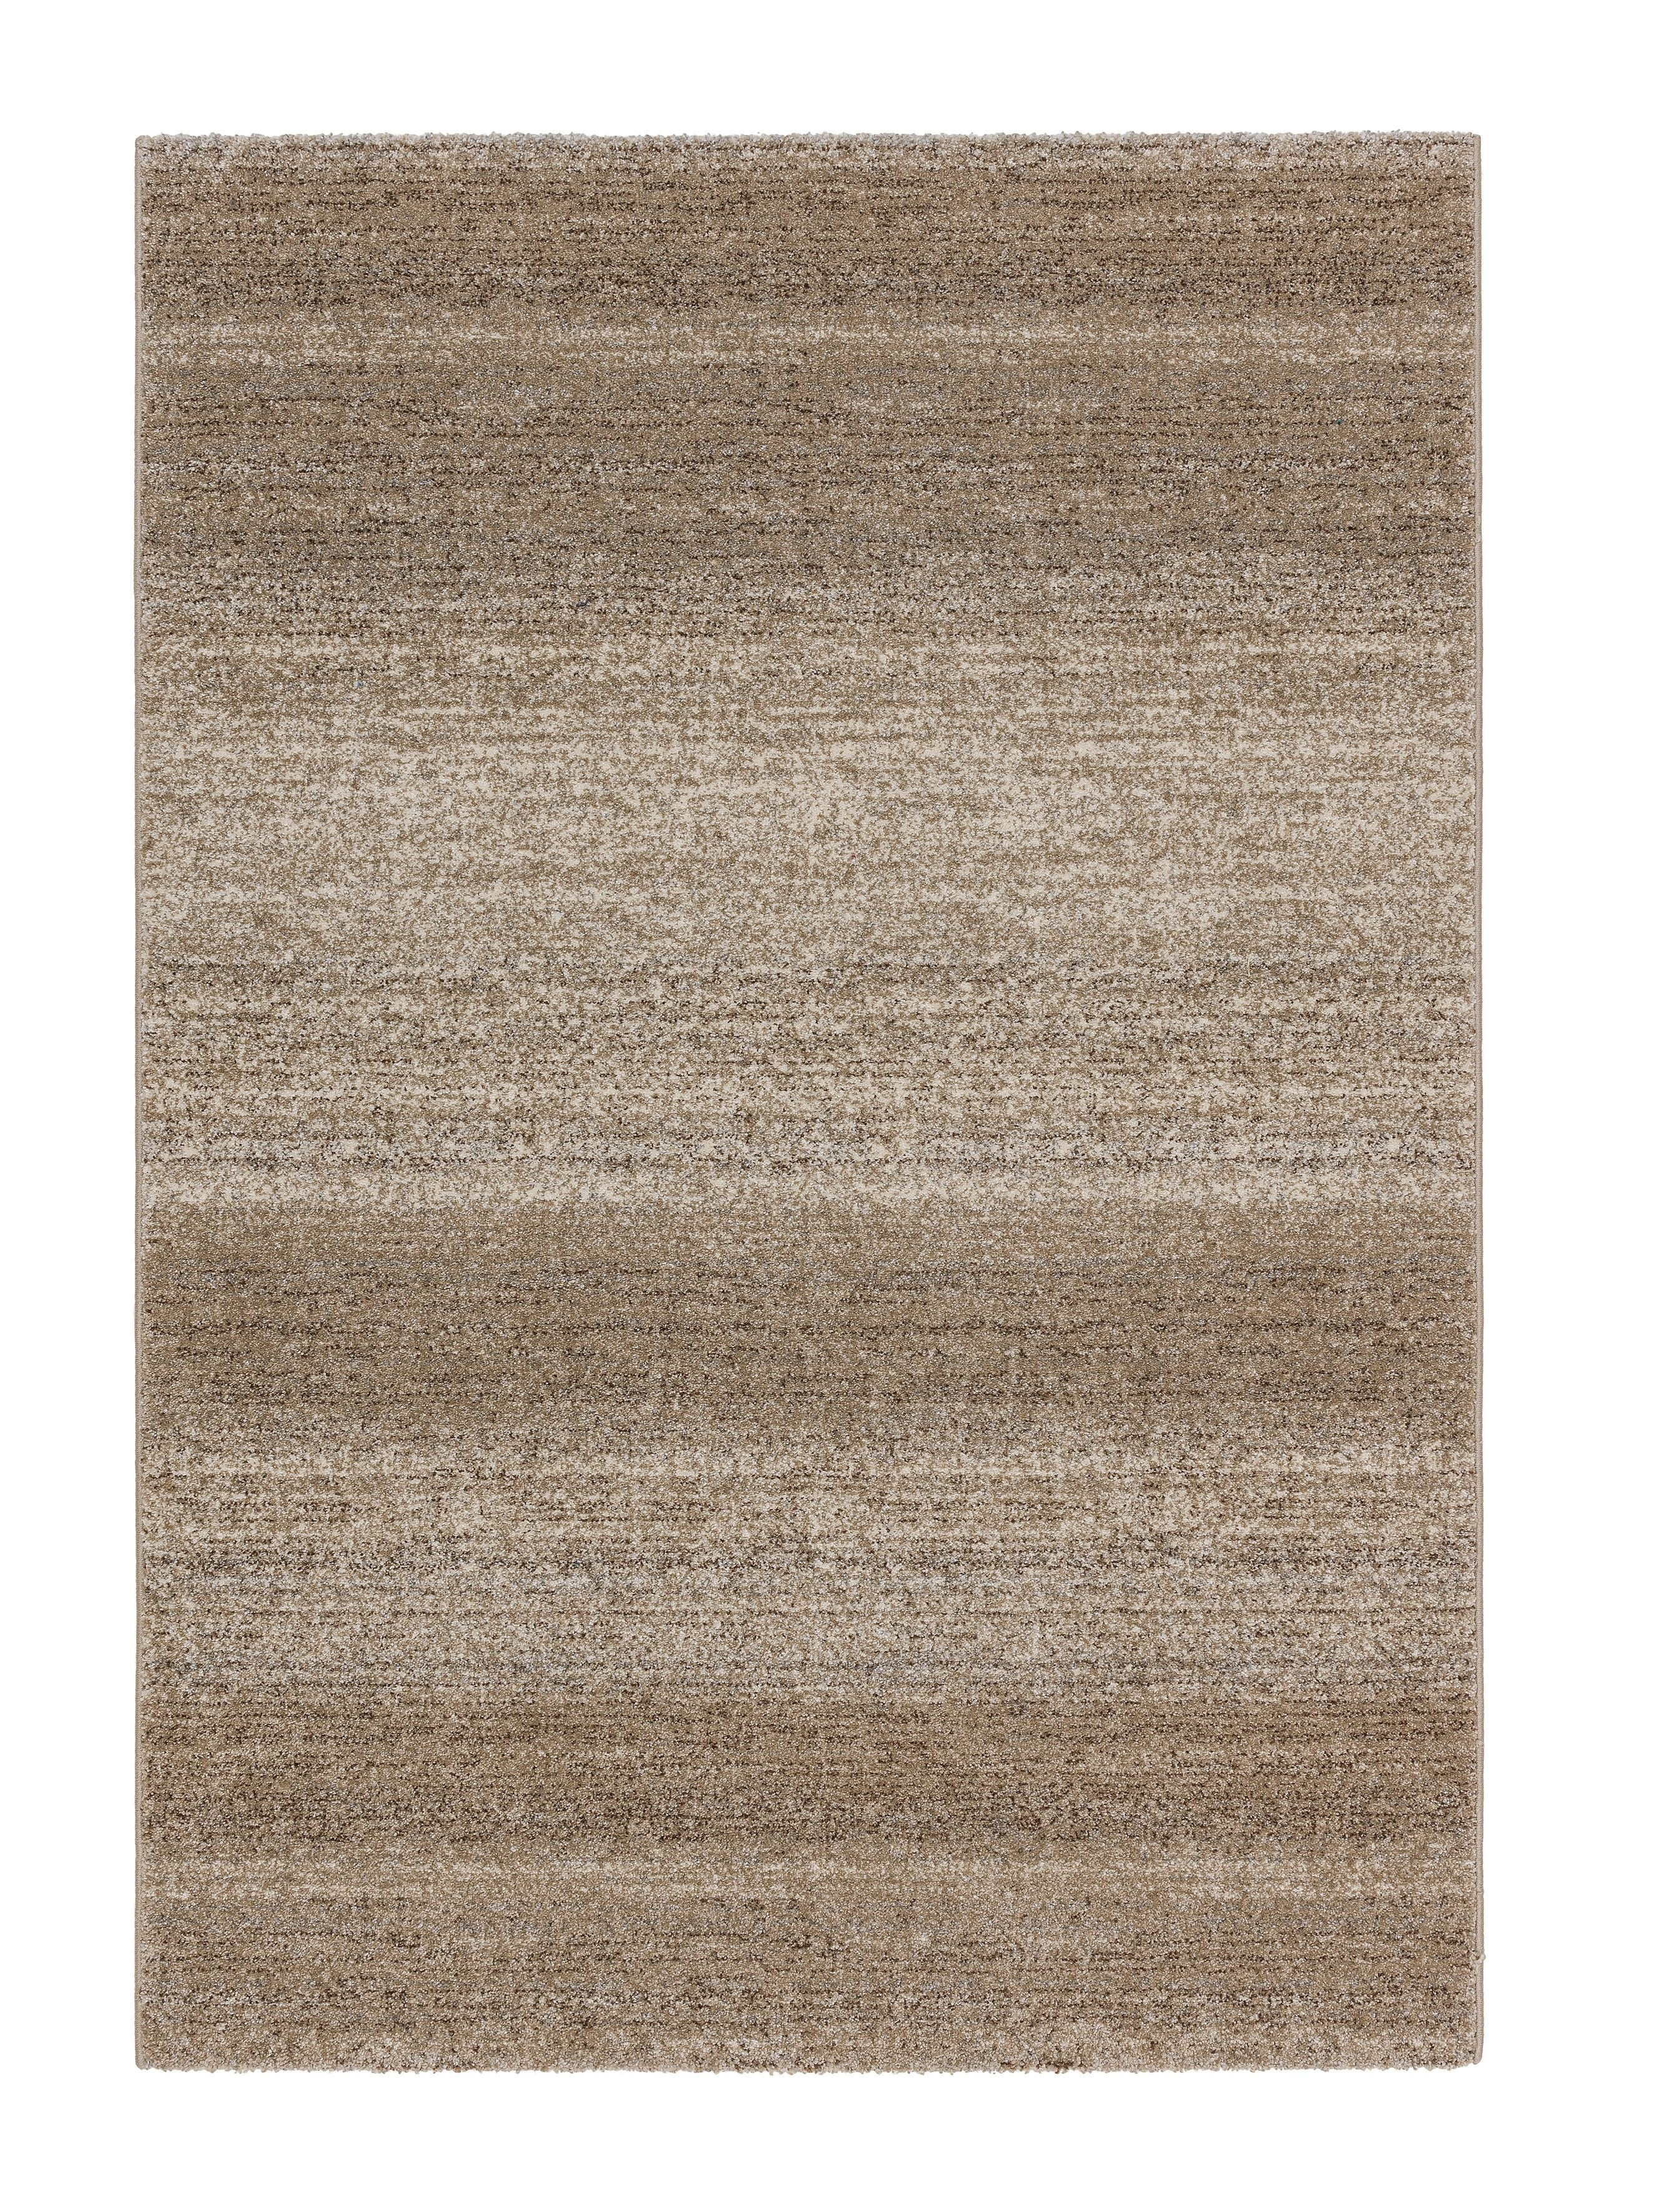 Astra - Golze koberce Kusový koberec Carpi 150006 Beige - 133x190 cm